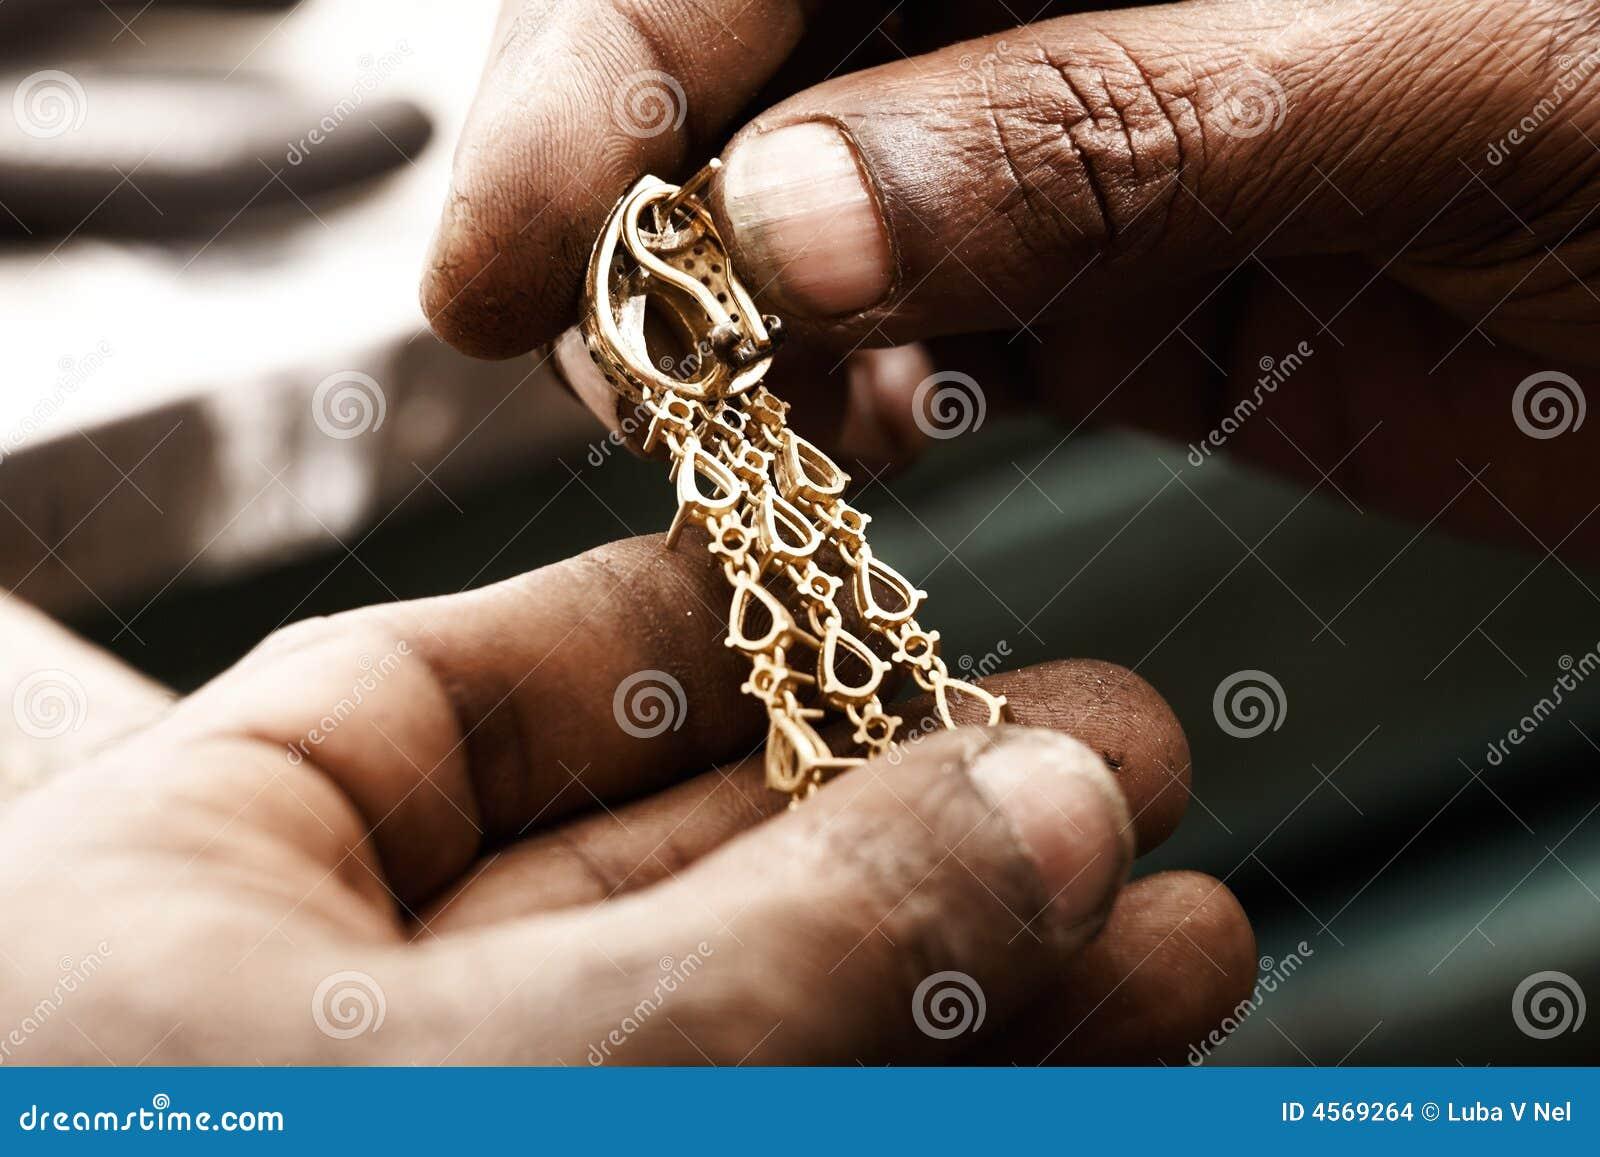 Goldschmied  Goldschmied Und Ohrring Stockbilder - Bild: 4569264